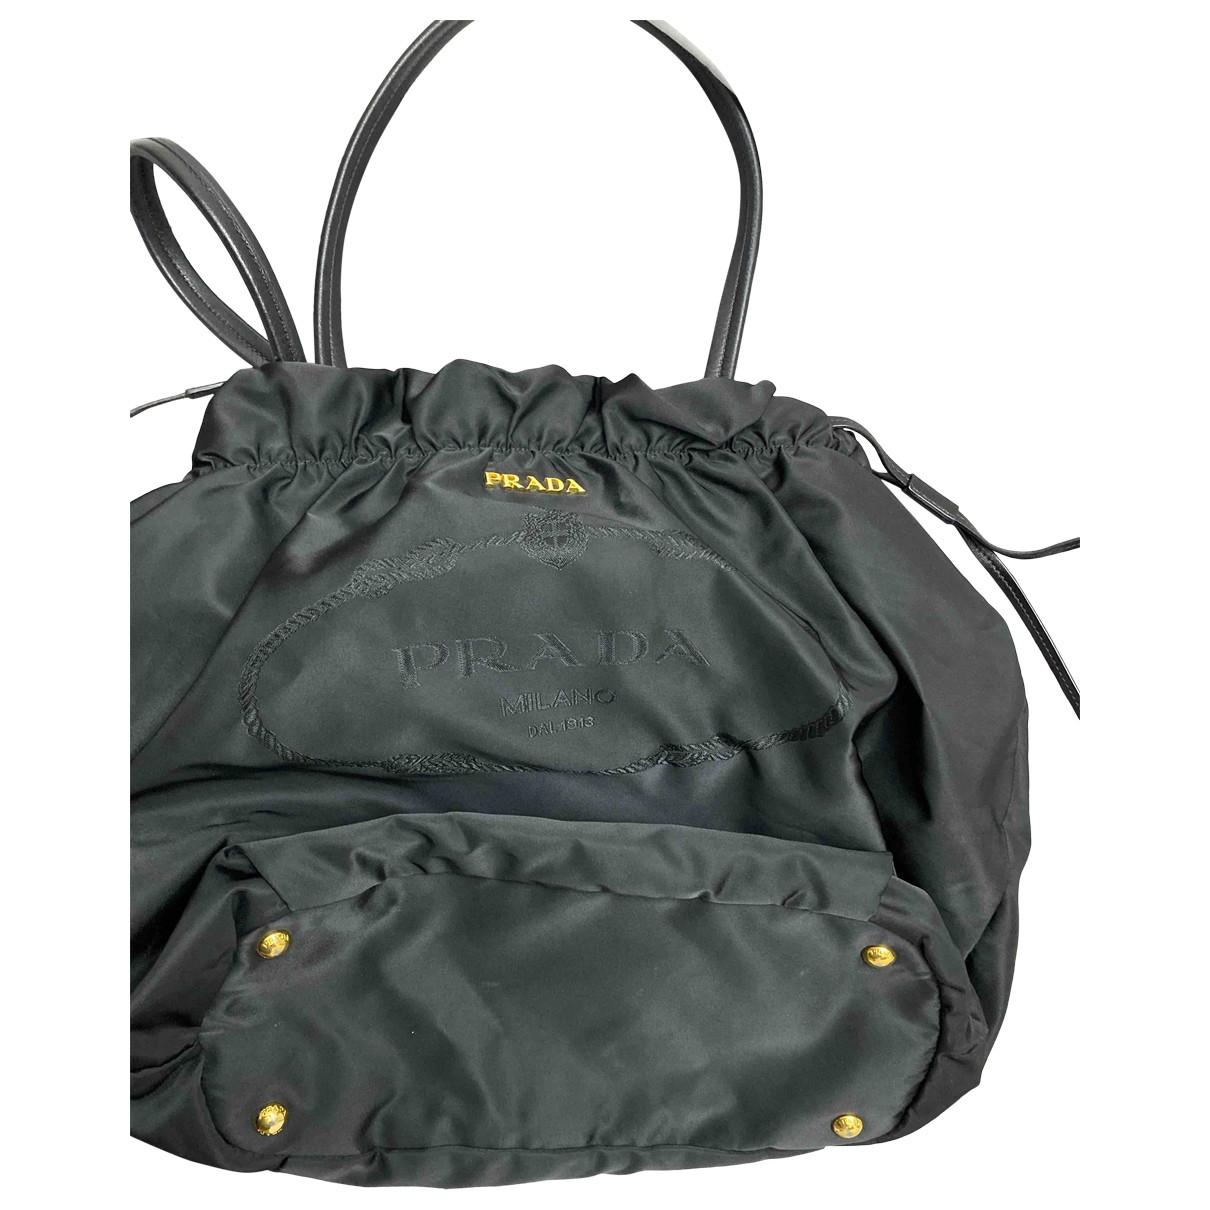 Prada \N Handtasche in  Schwarz Synthetik